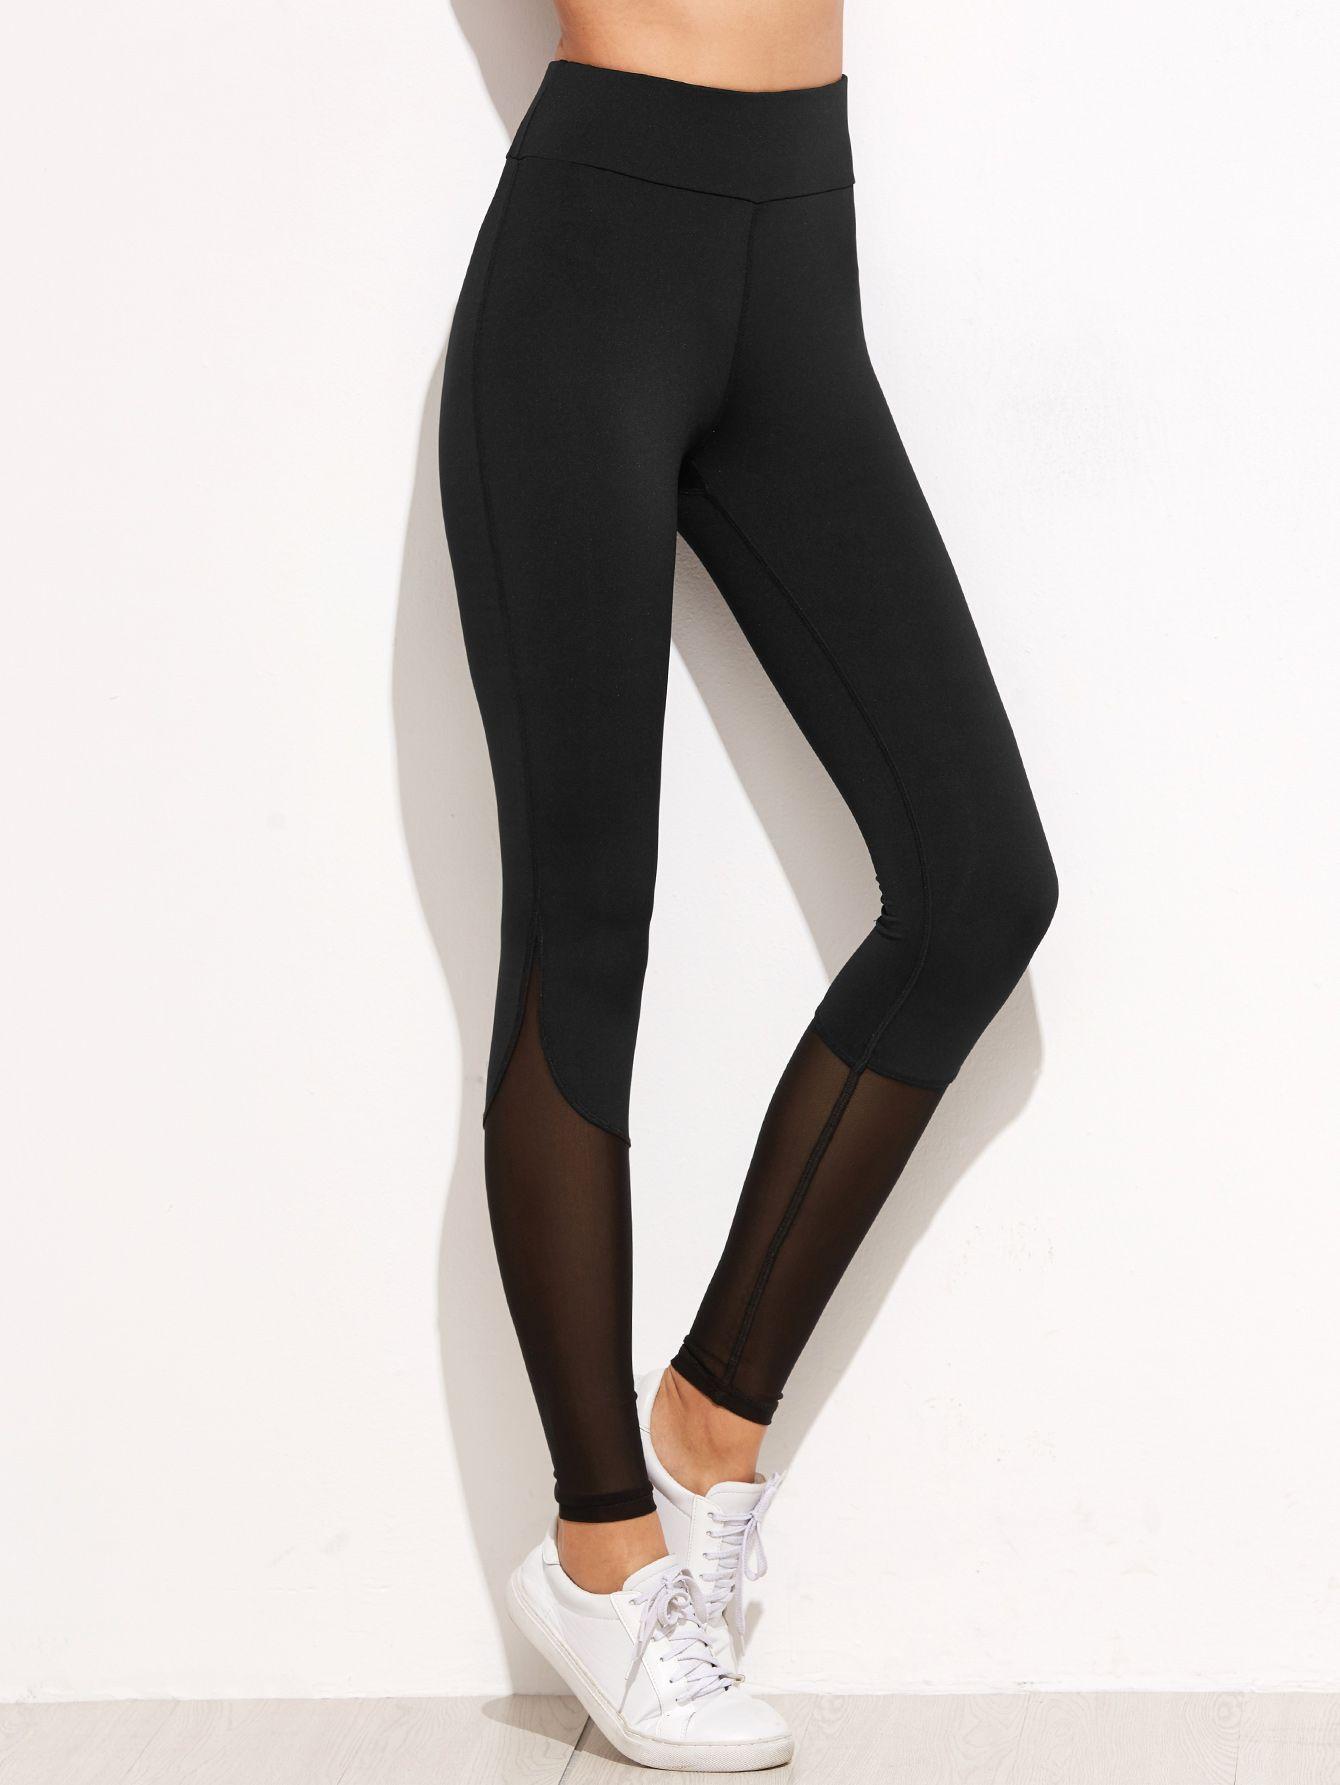 6655fefdd1d428 Shop Black Contrast Mesh Leggings online. SheIn offers Black Contrast Mesh  Leggings & more to fit your fashionable needs.